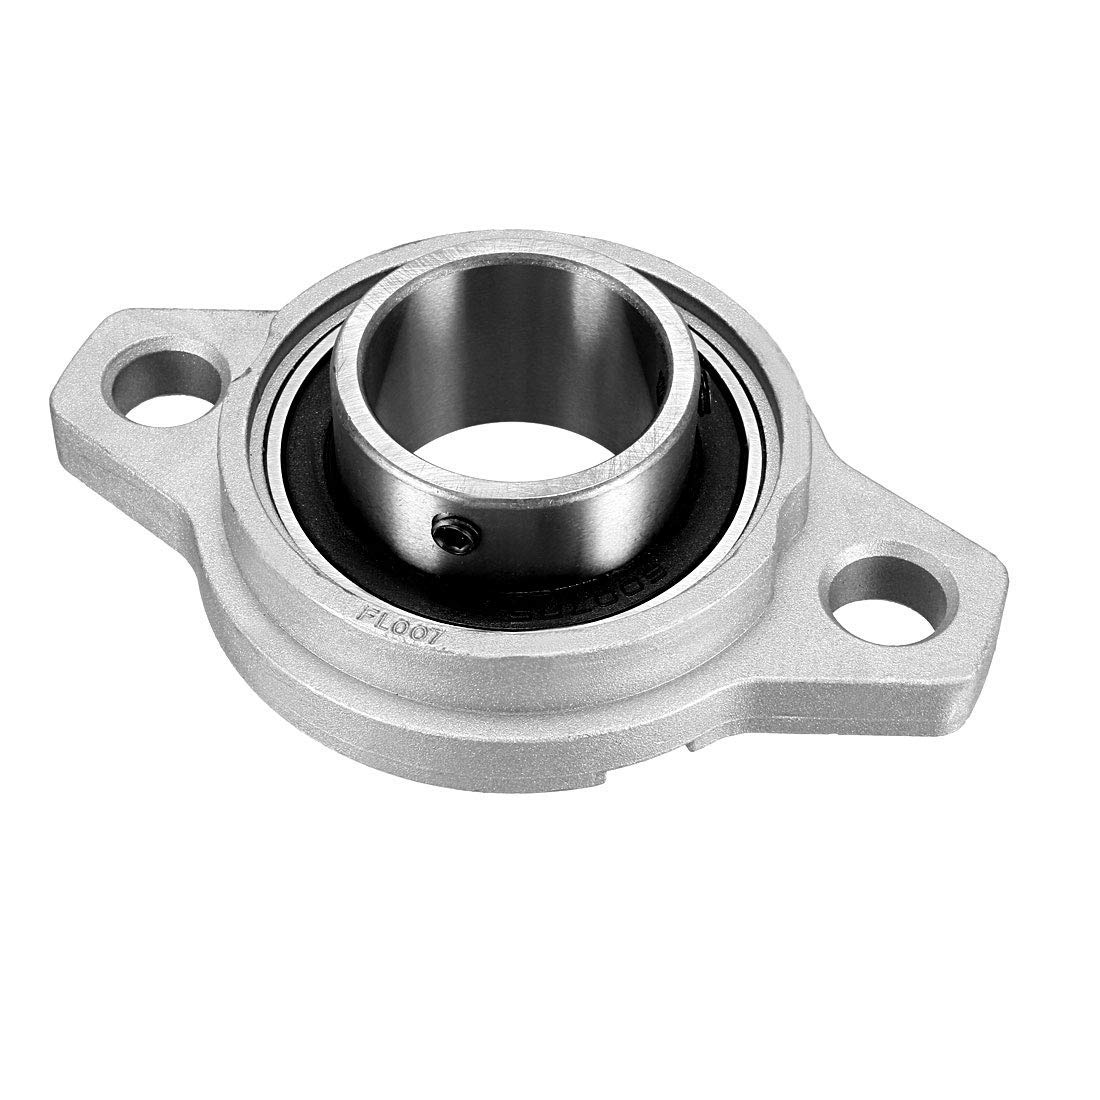 35mm bore Diameter KFL007 Flange pad Block Bearing Locking Screw Lock Package of 1 zinc Alloy//Chrome Steel